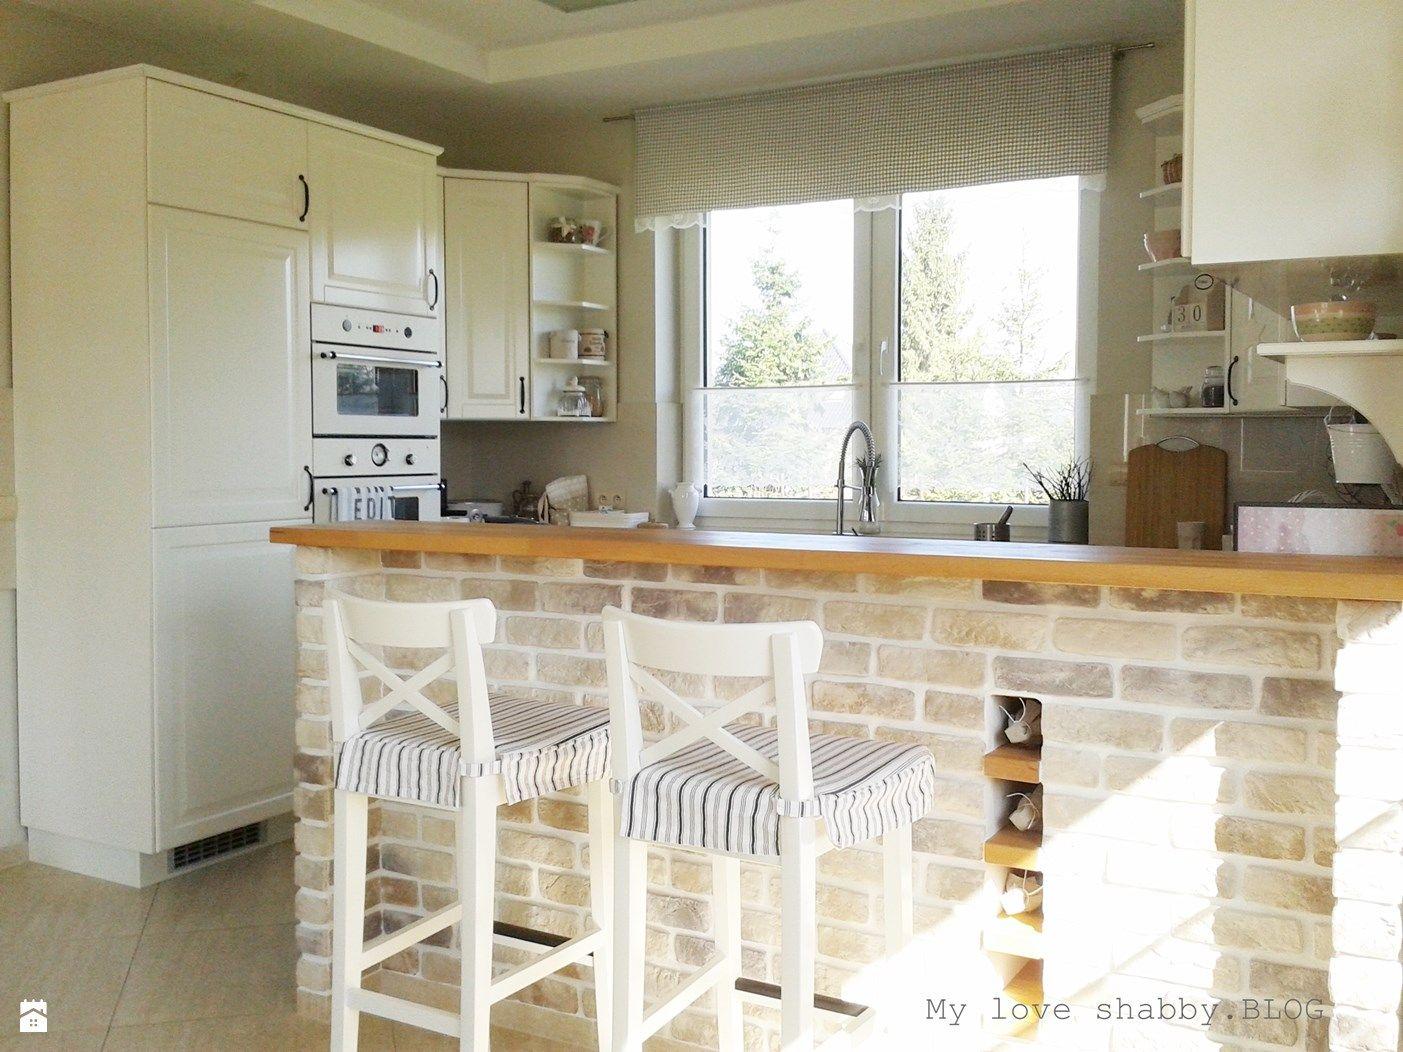 Zdjecie Biala Kuchnia Z Drewnianymi Blatami Popular Kitchen Designs Kitchen Inspiration Design Kitchen Design